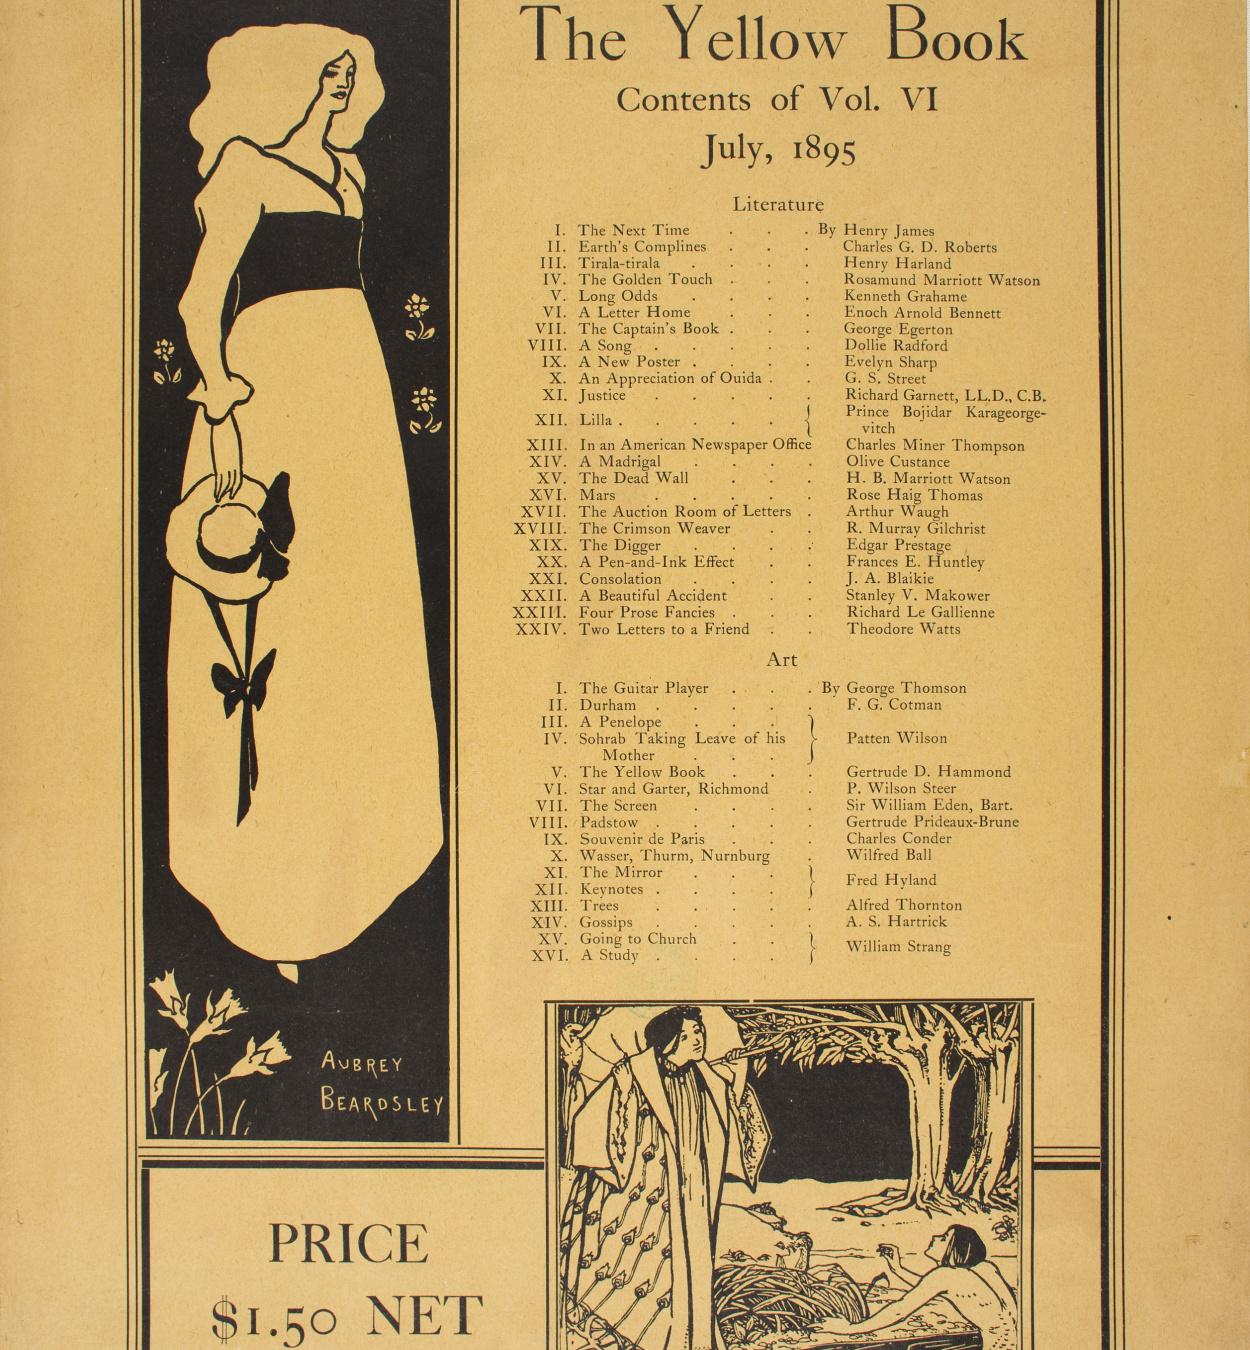 Aubrey Vincent Beardsley - The Yellow Book (July 1895) - 1895